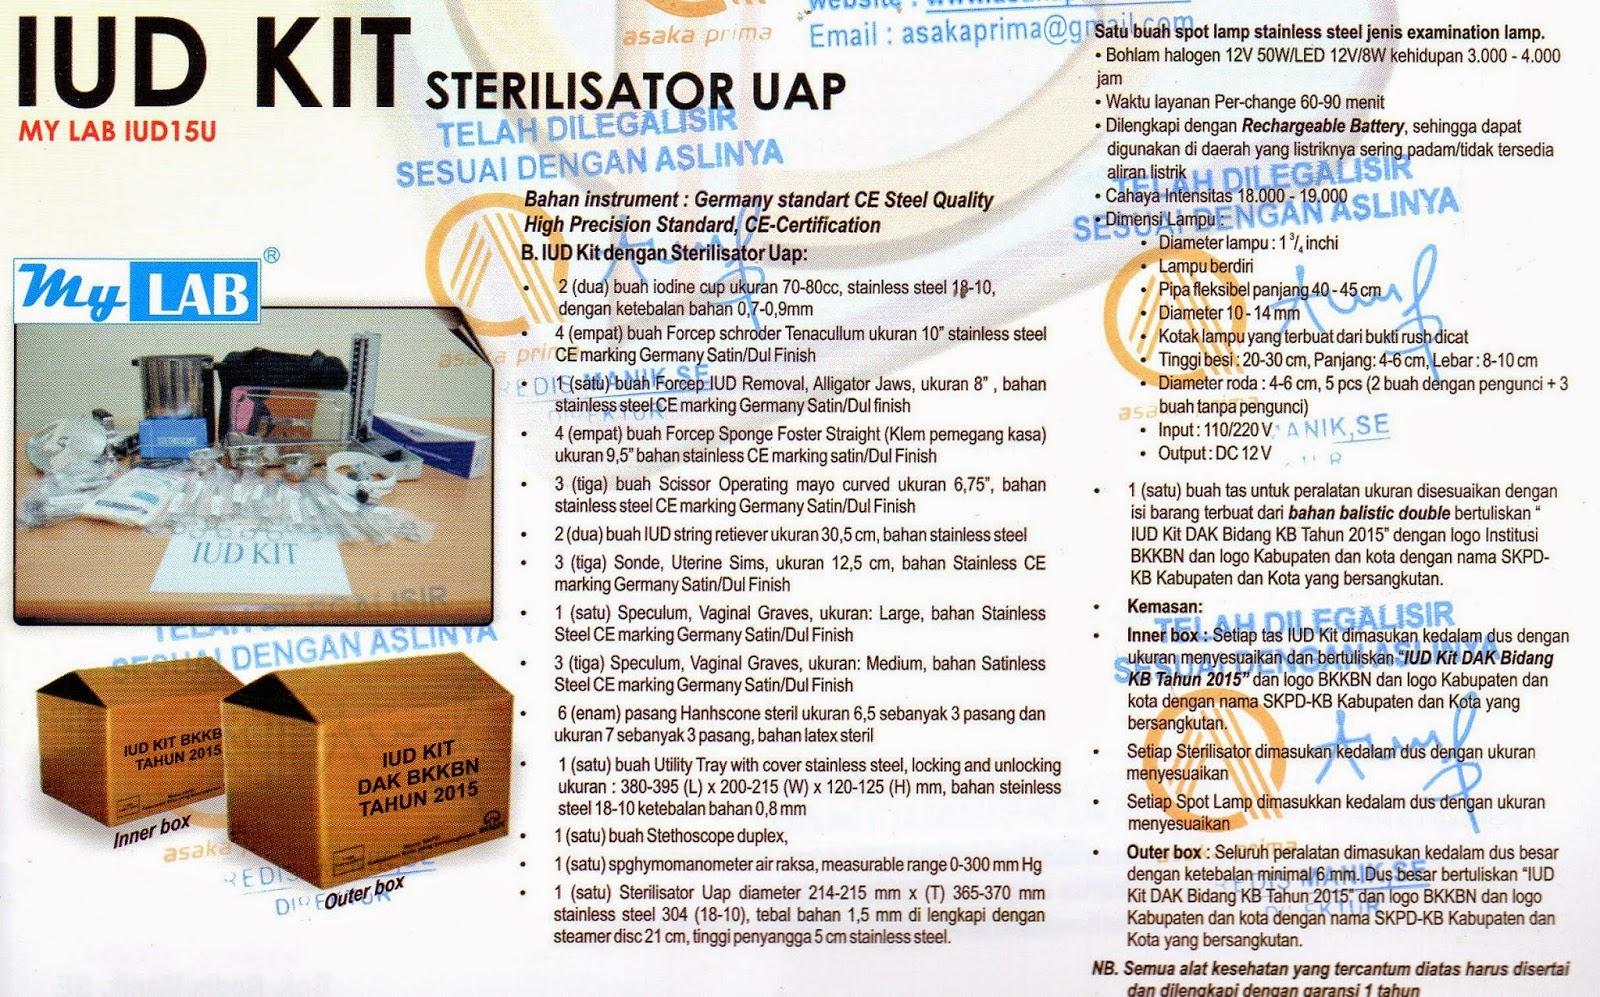 (DAK BIDANG KB 2015 )  IUD Kit dengan Sterilisator Listrik  IUD KIT BKKbN